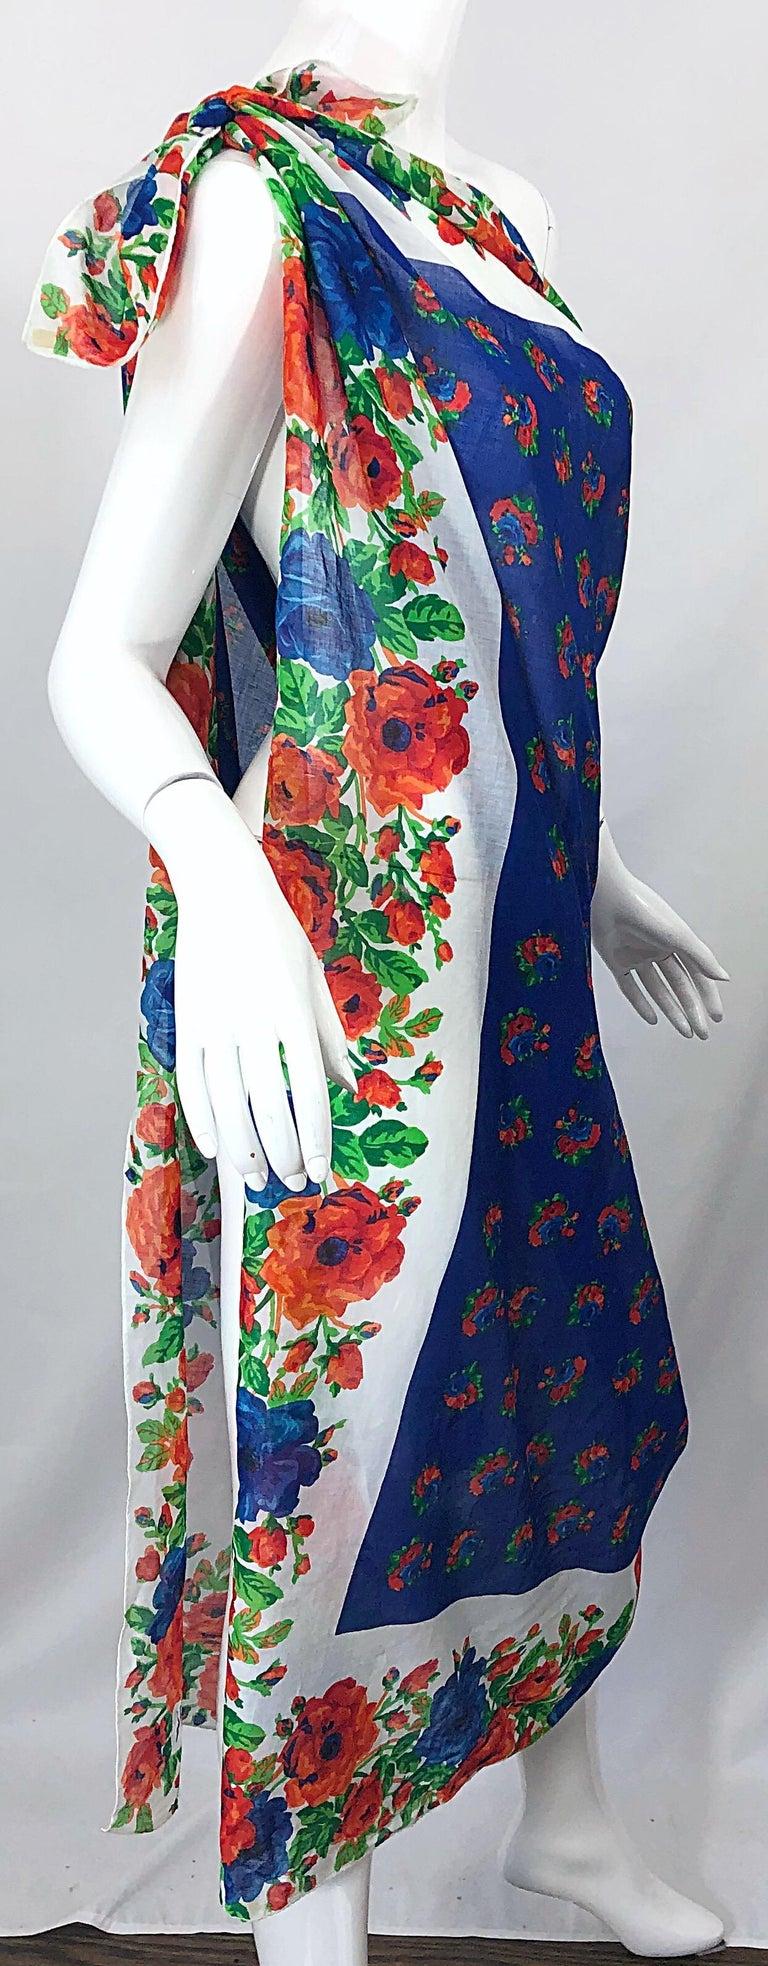 Huge Vintage Yves Saint Laurent YSL 54 x 54 Inch Cotton Voile Scarf Parero Shawl For Sale 2